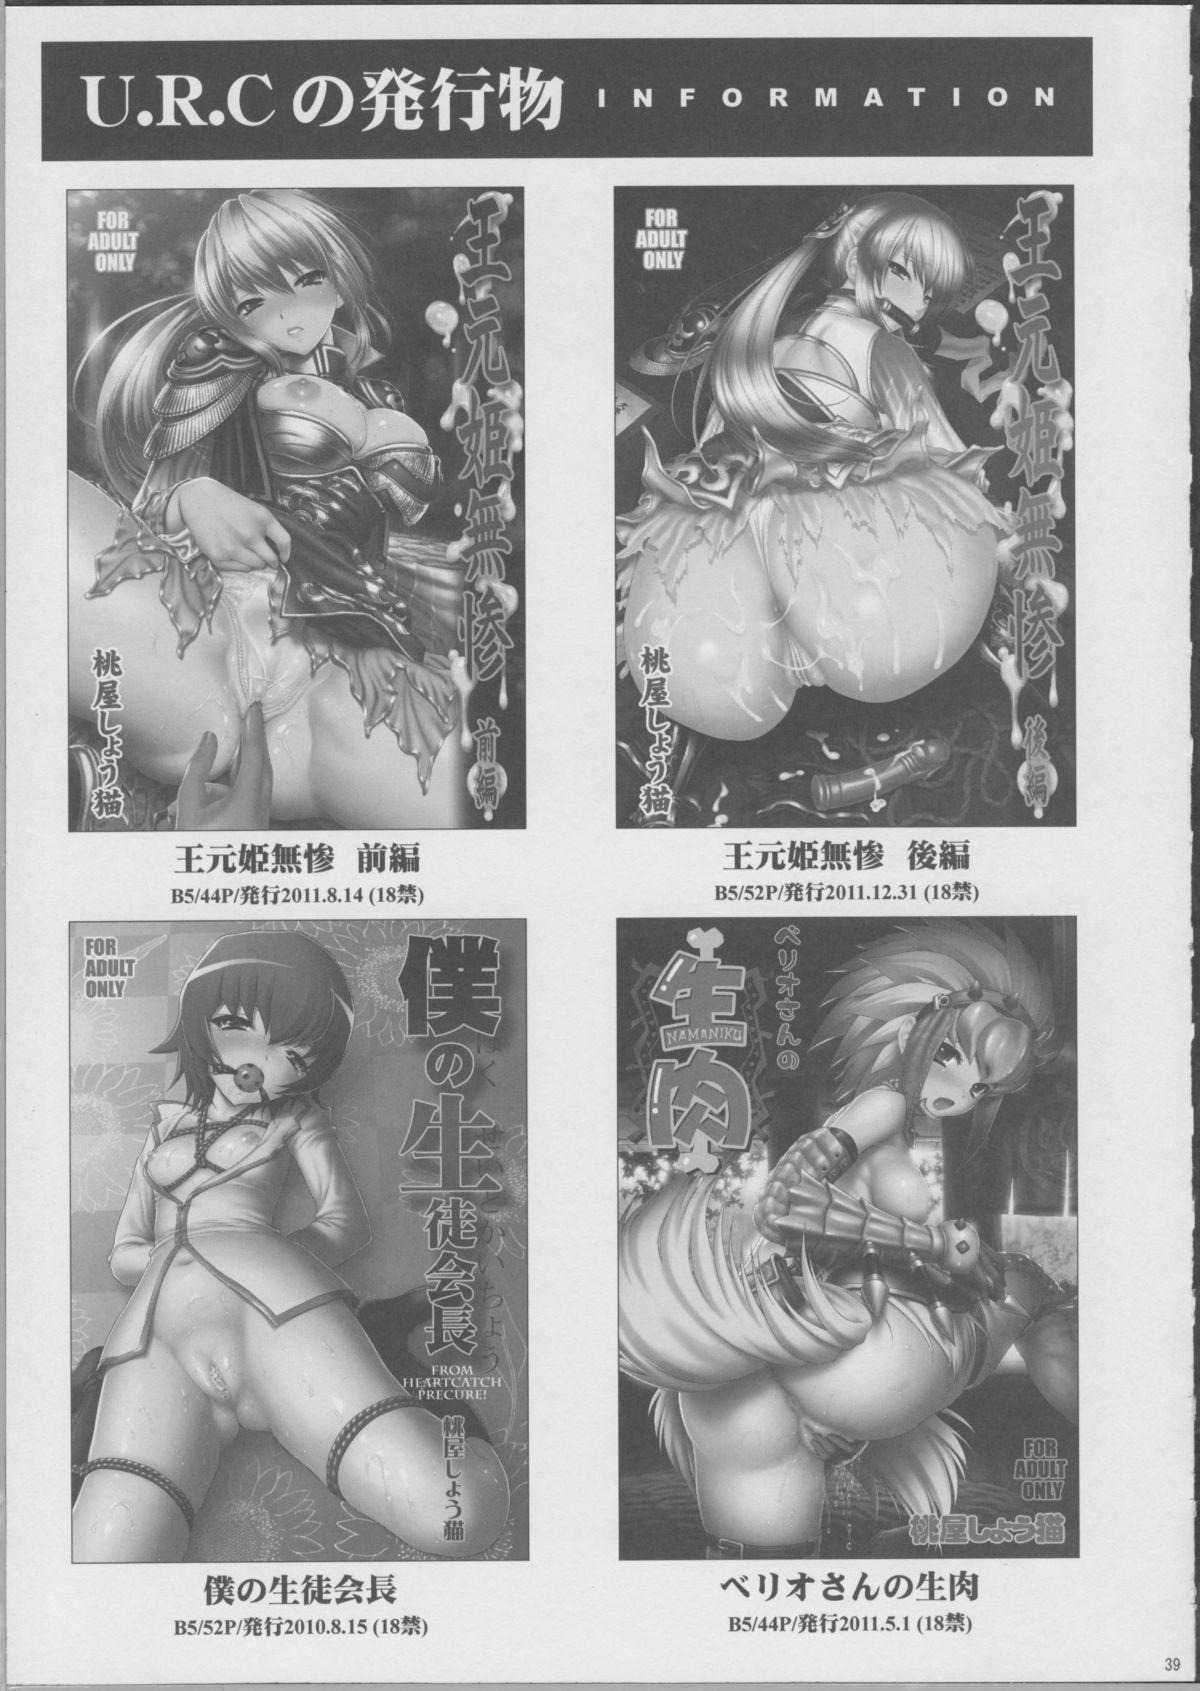 Hibiki de asobou ♪ 37